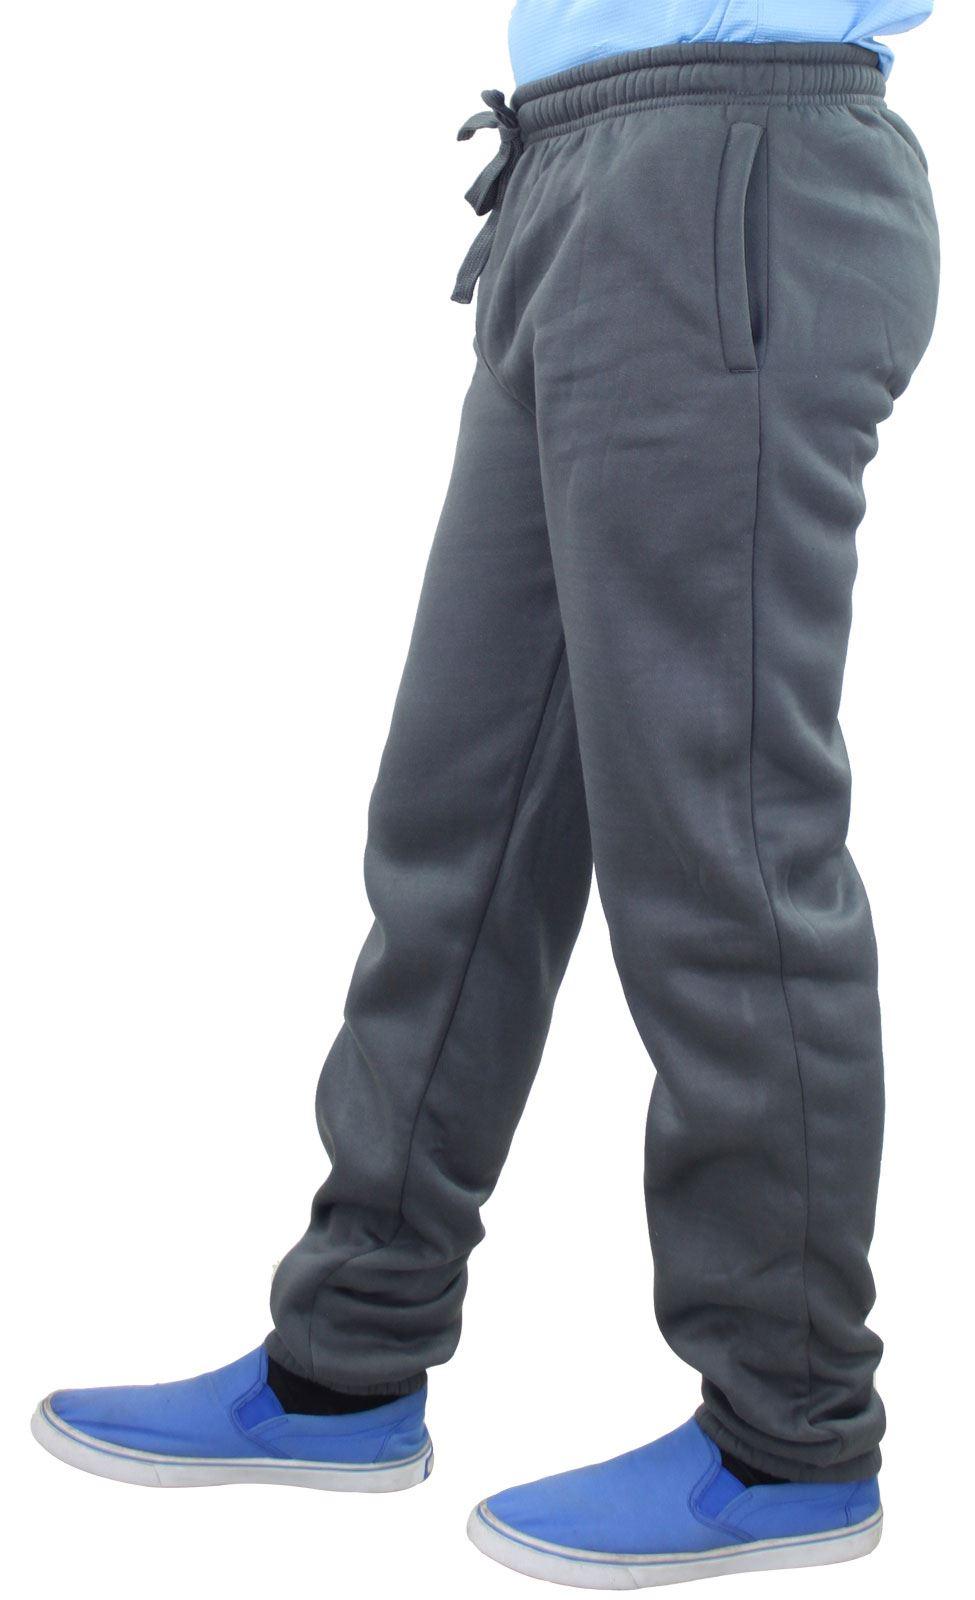 Mens-Women-Plain-Fleece-Joggers-Bottoms-Jogging-Pant-Gym-Fitness-Sports-Trousers thumbnail 4